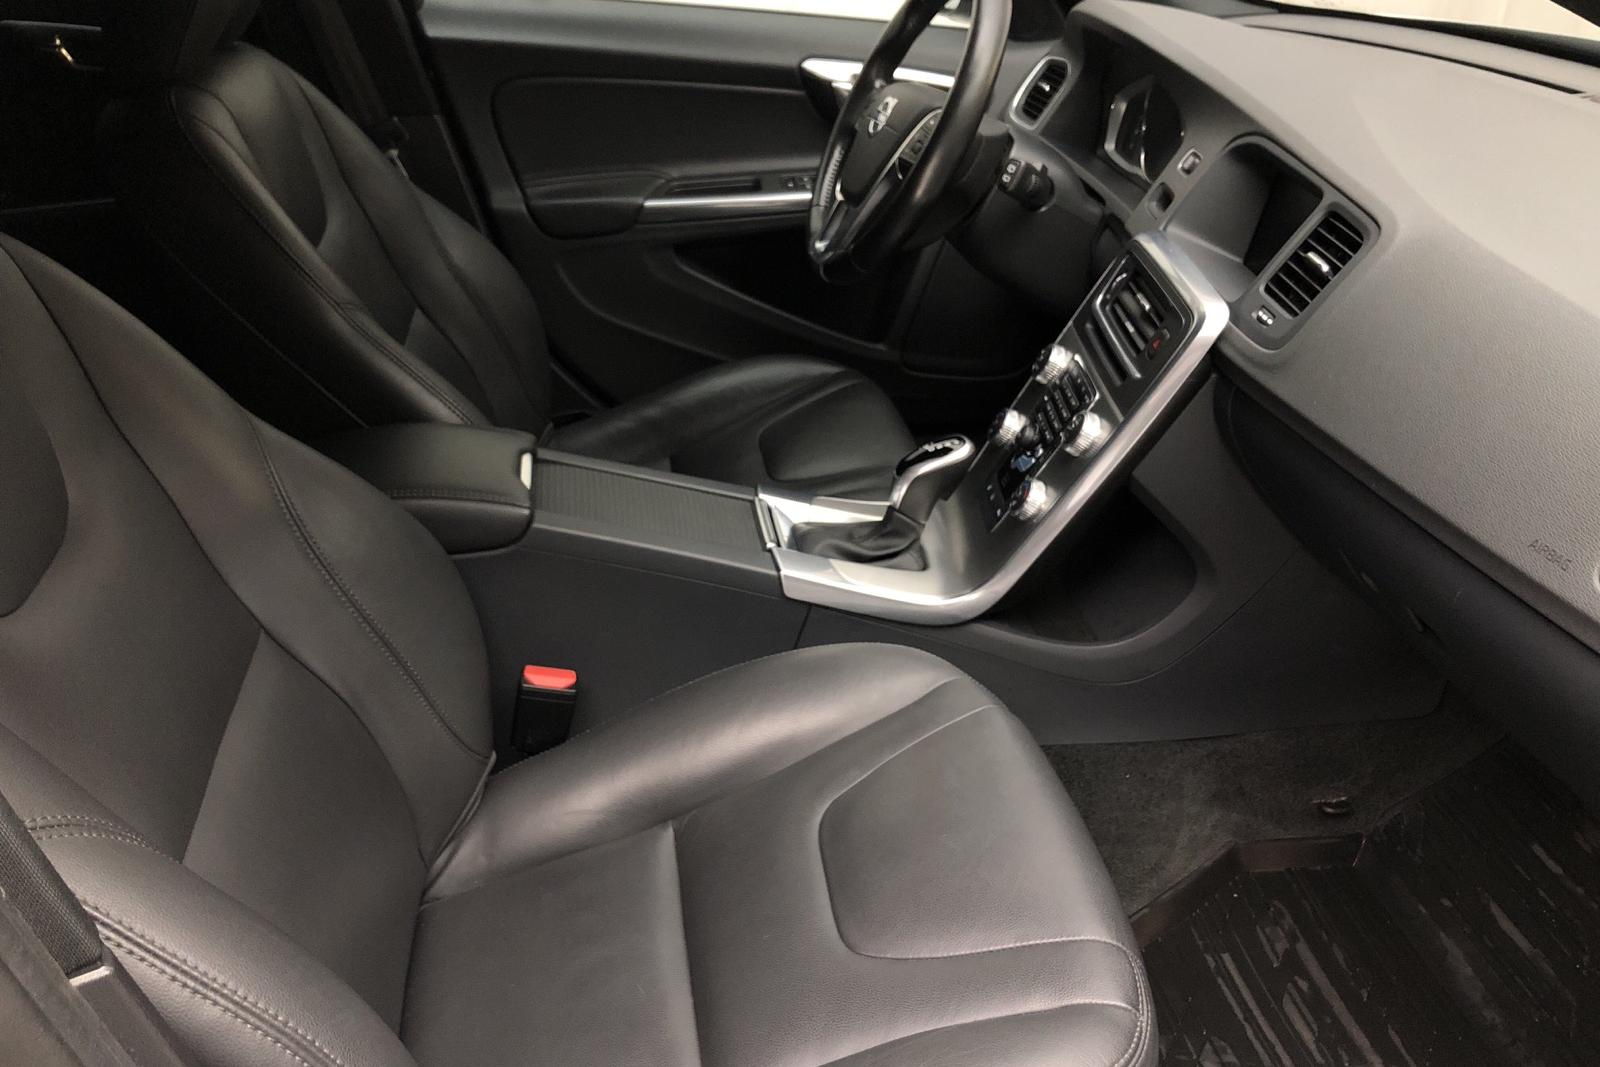 Volvo V60 D4 Cross Country (190hk) - 71 000 km - Automatic - silver - 2017